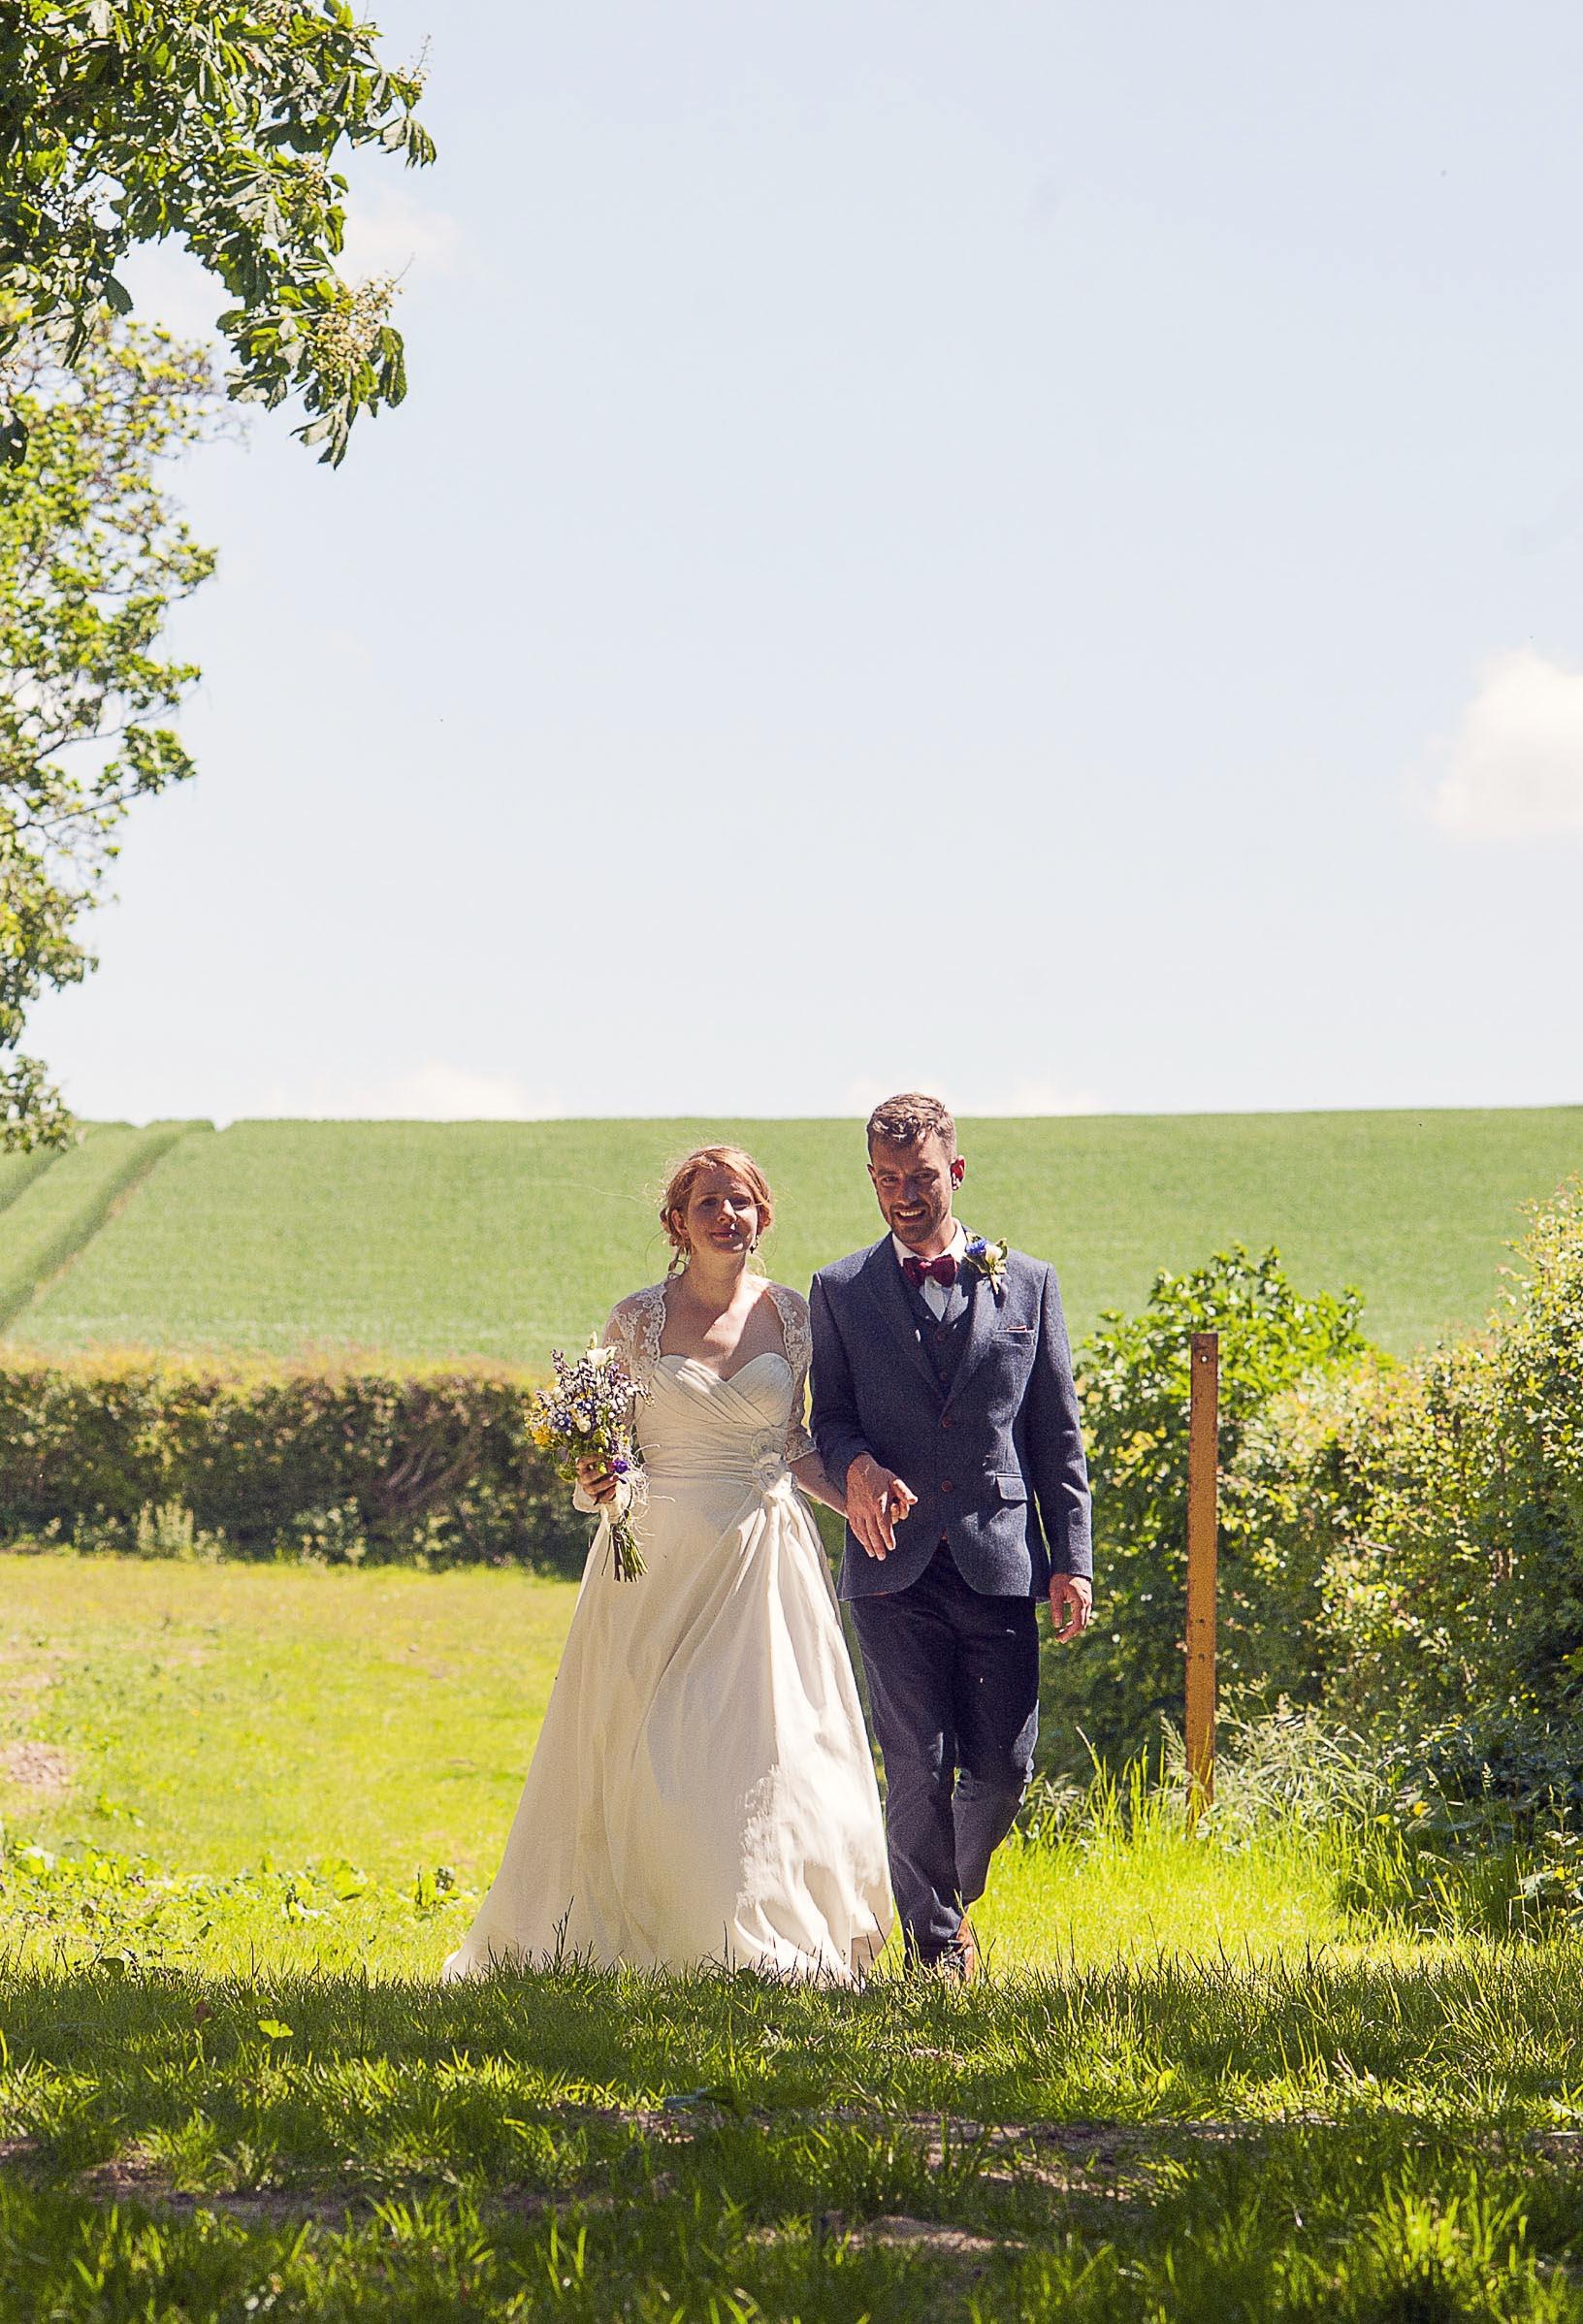 Wedding couple strolling through a summer field